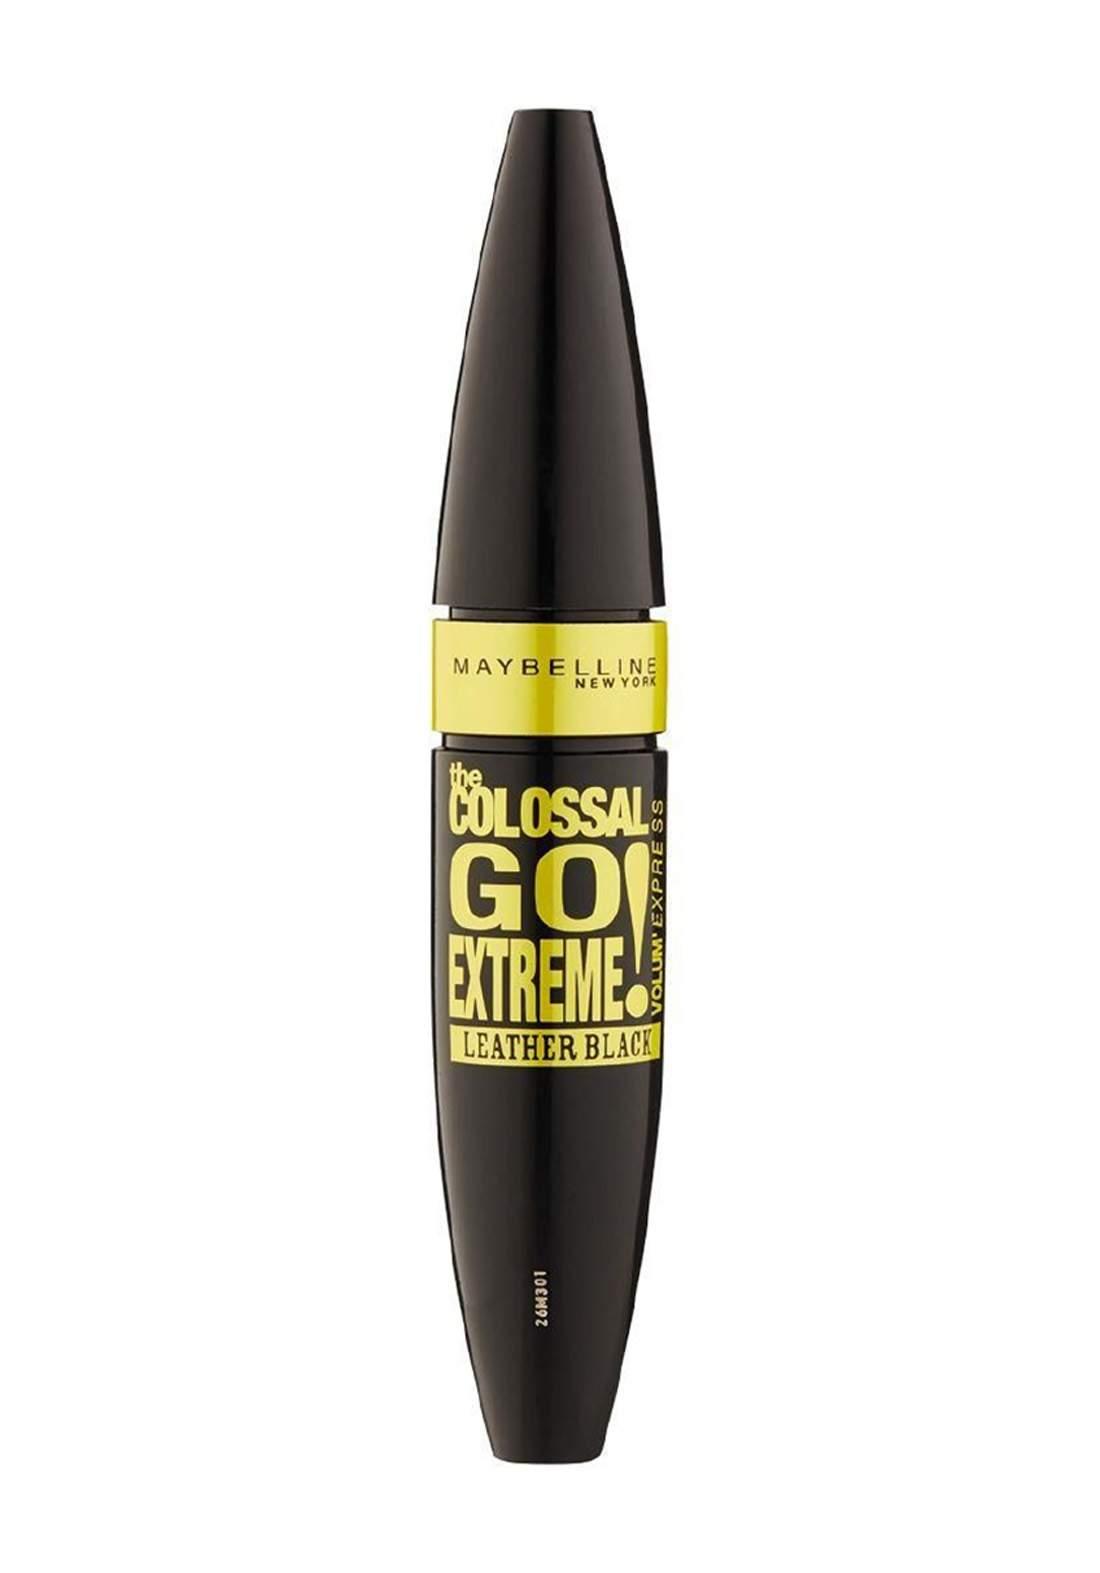 Maybelline Volum' Express Colossal Go Extreme Leather Black مسكارا